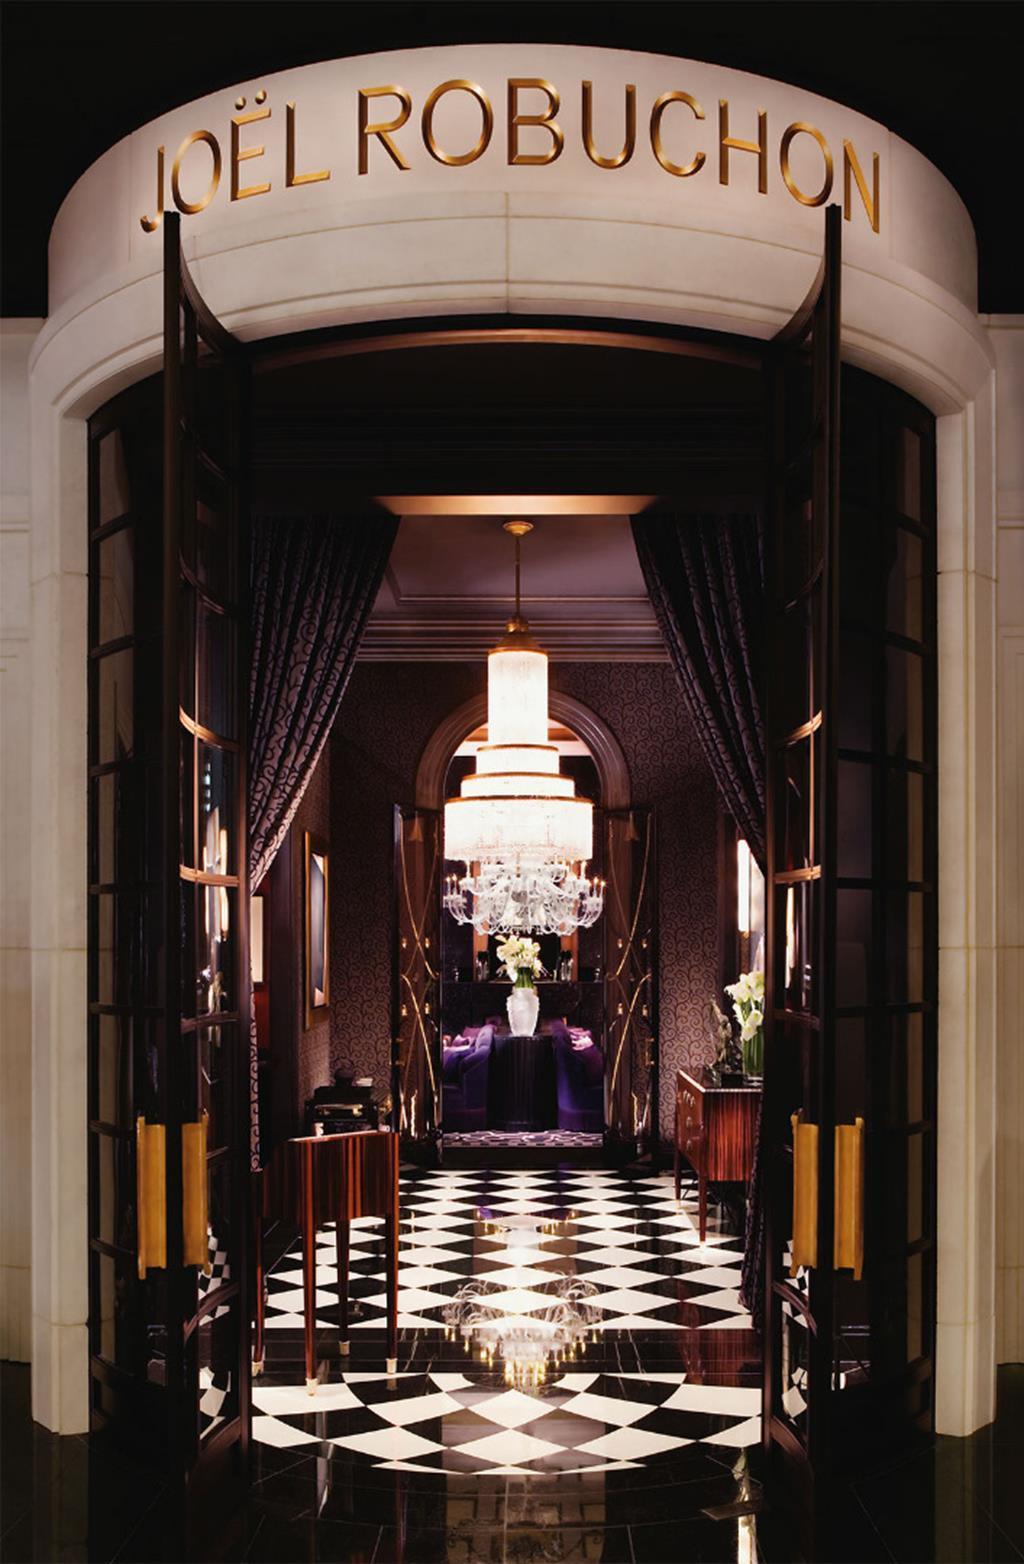 Joël Robuchon Restaurant Las Vegas | Centurion Magazine